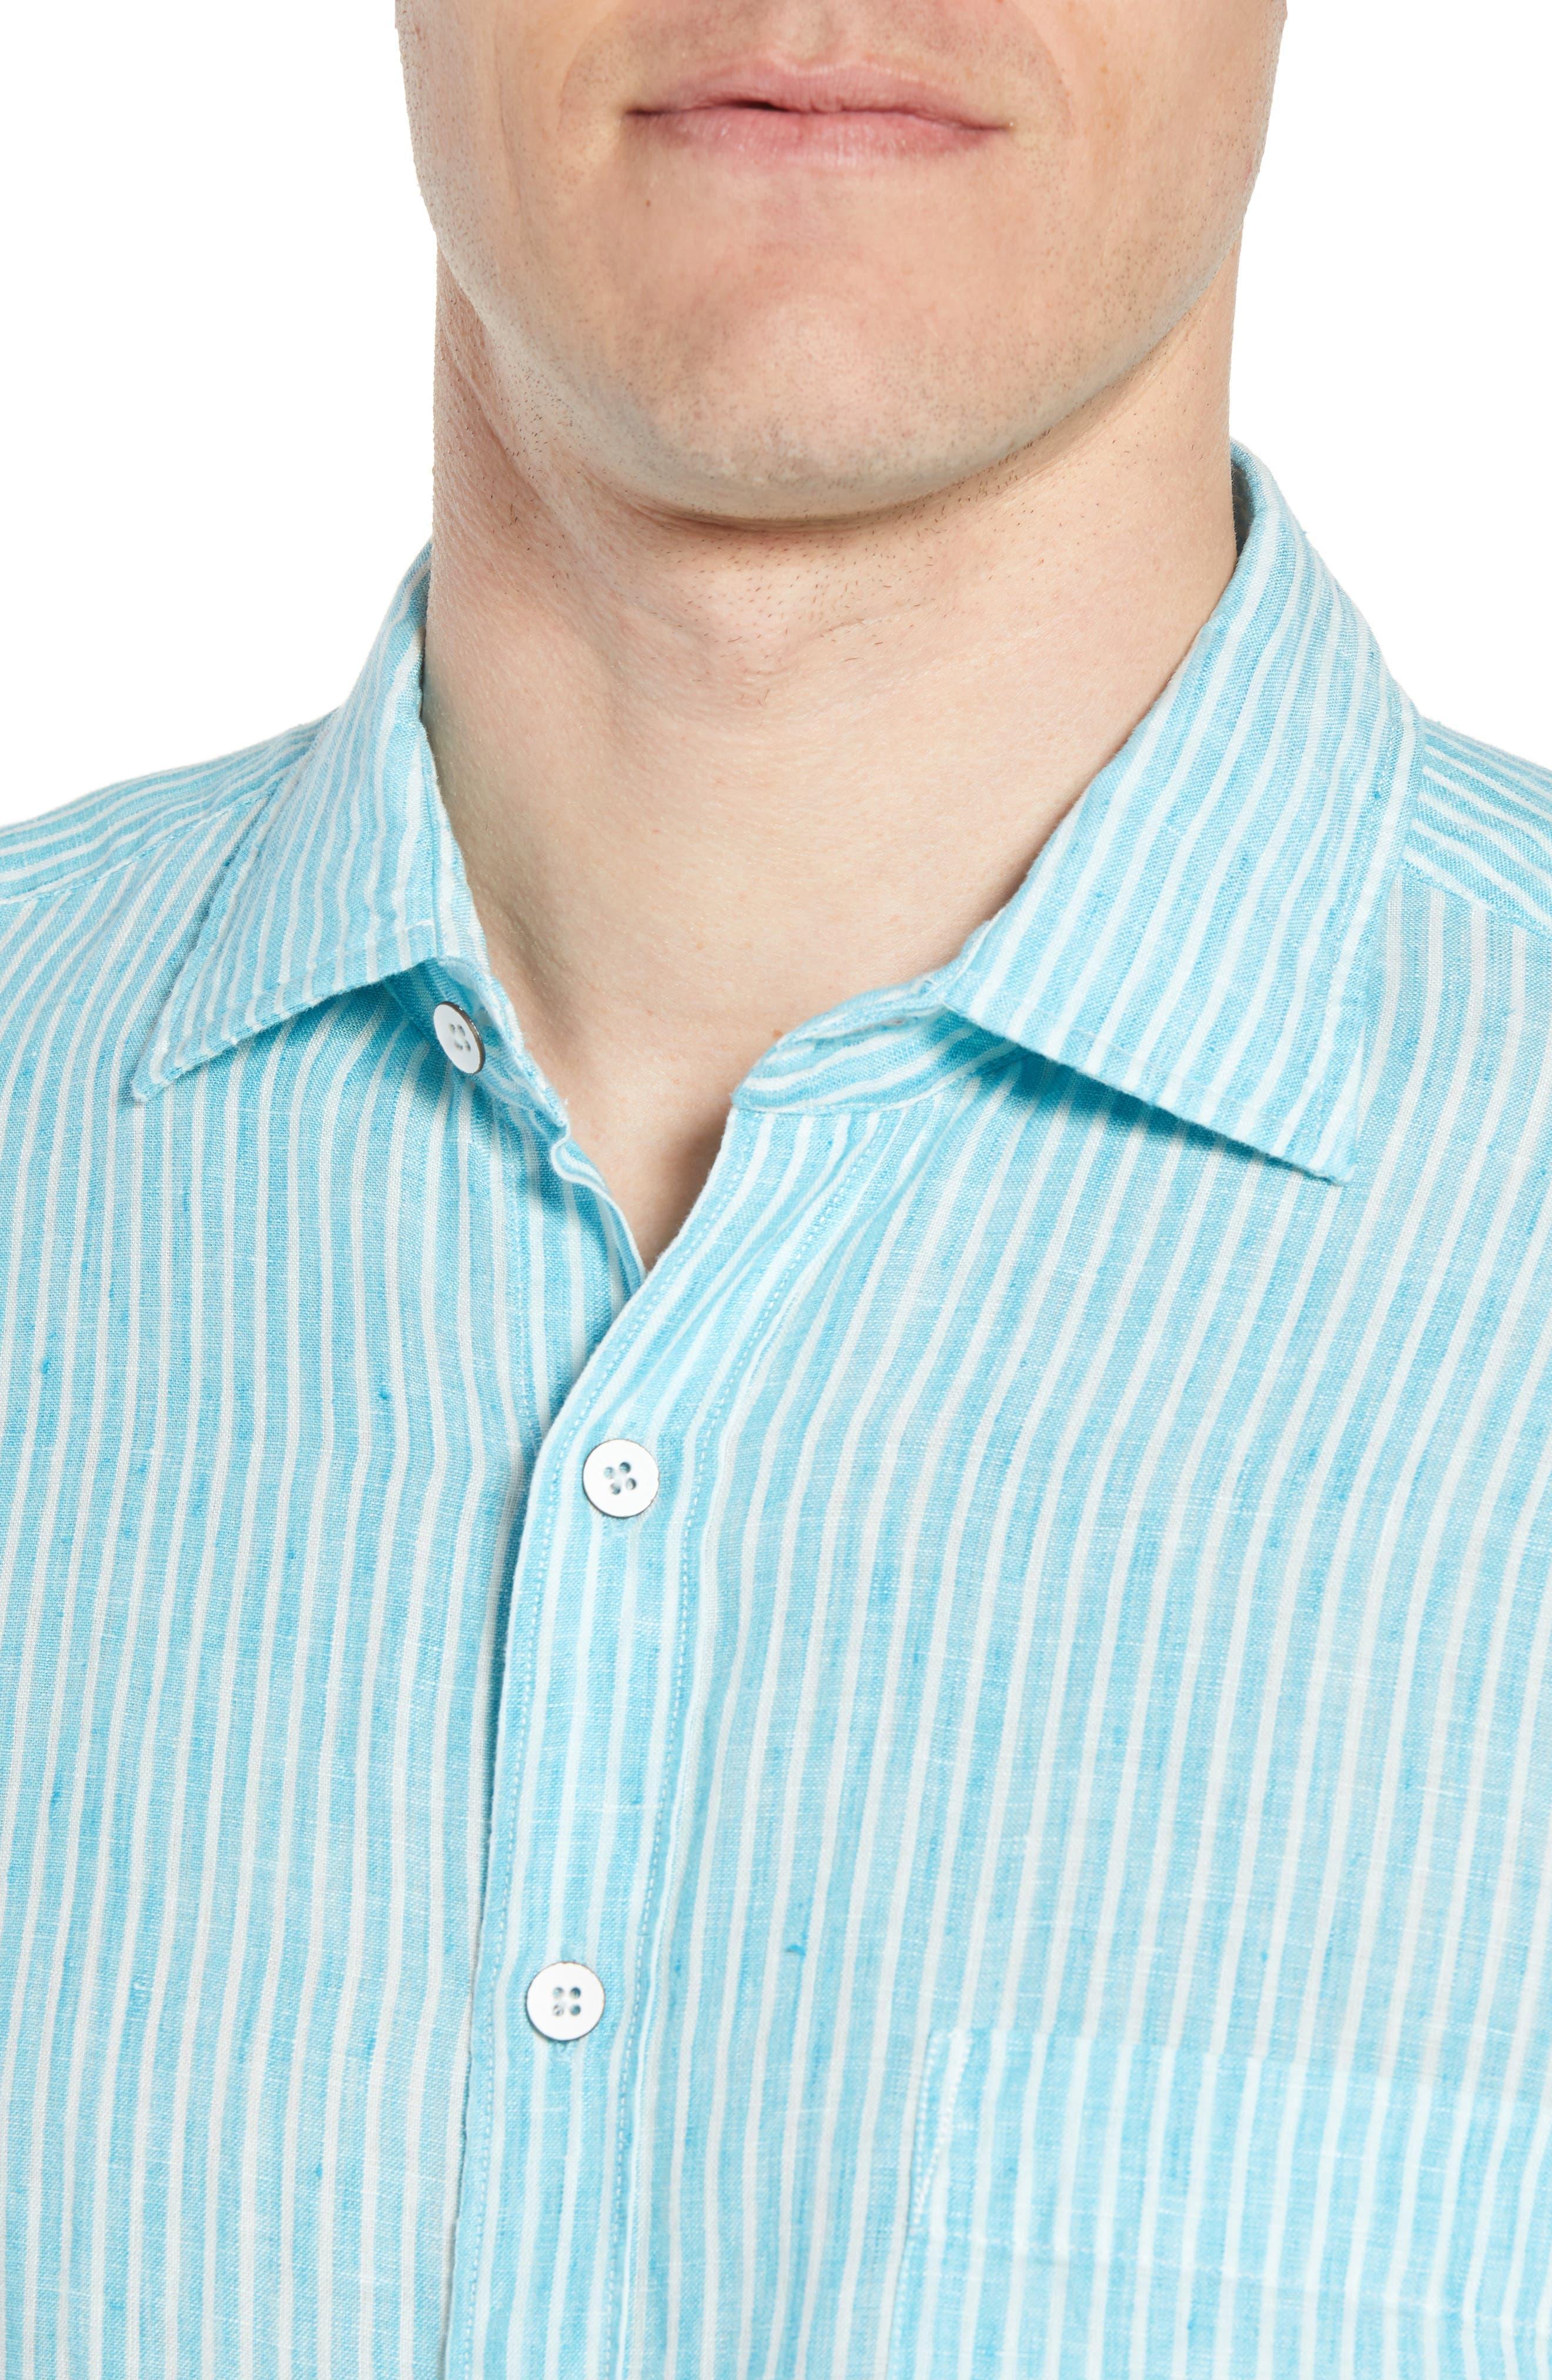 Warwick Junction Stripe Linen Sport Shirt,                             Alternate thumbnail 4, color,                             TEAL